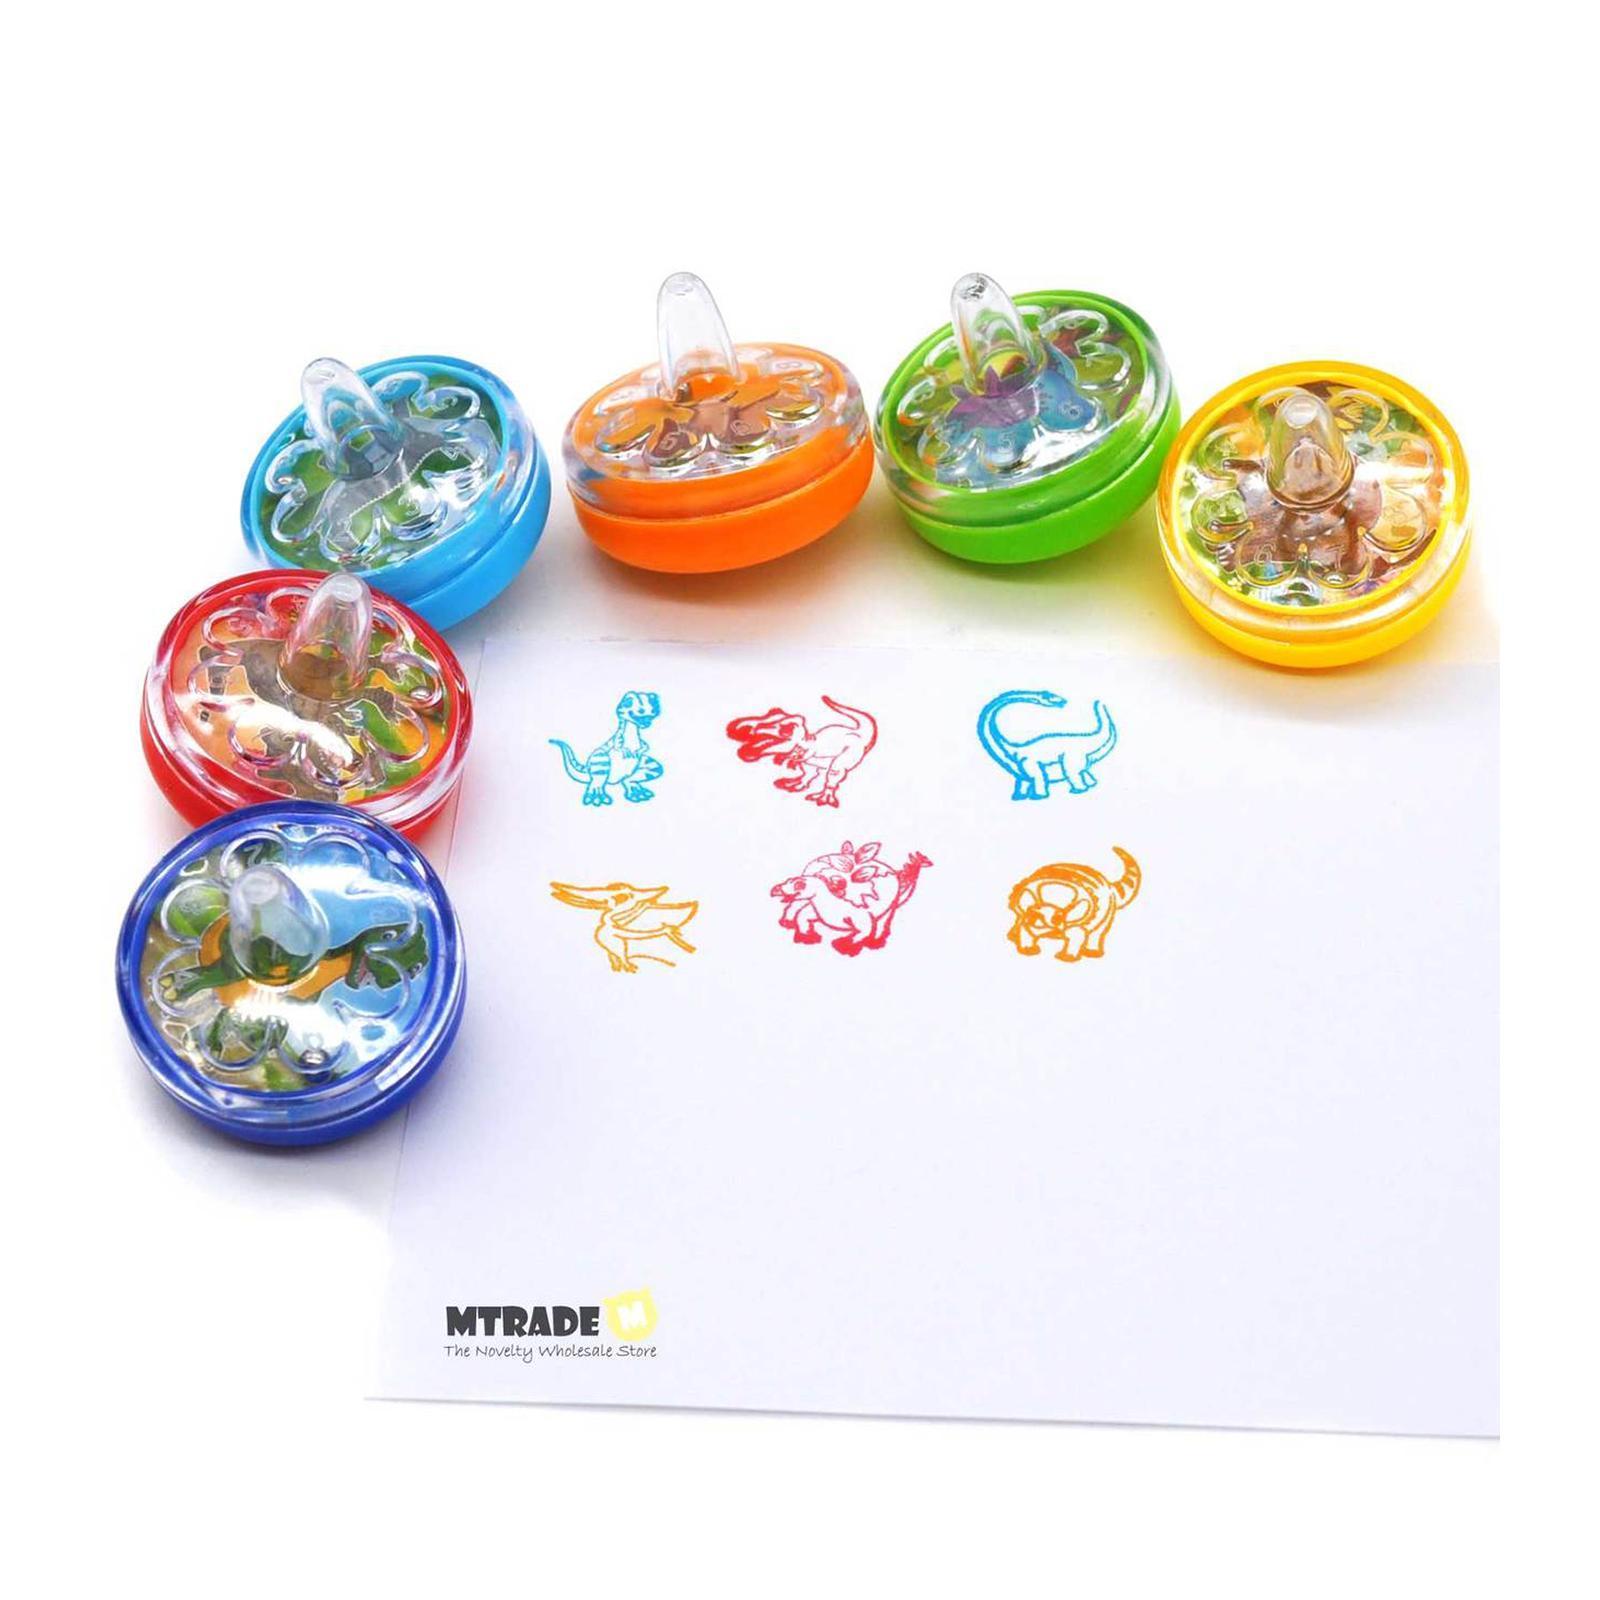 MTRADE Dinosaur Peg-Top Stamper 24 PCS / Box